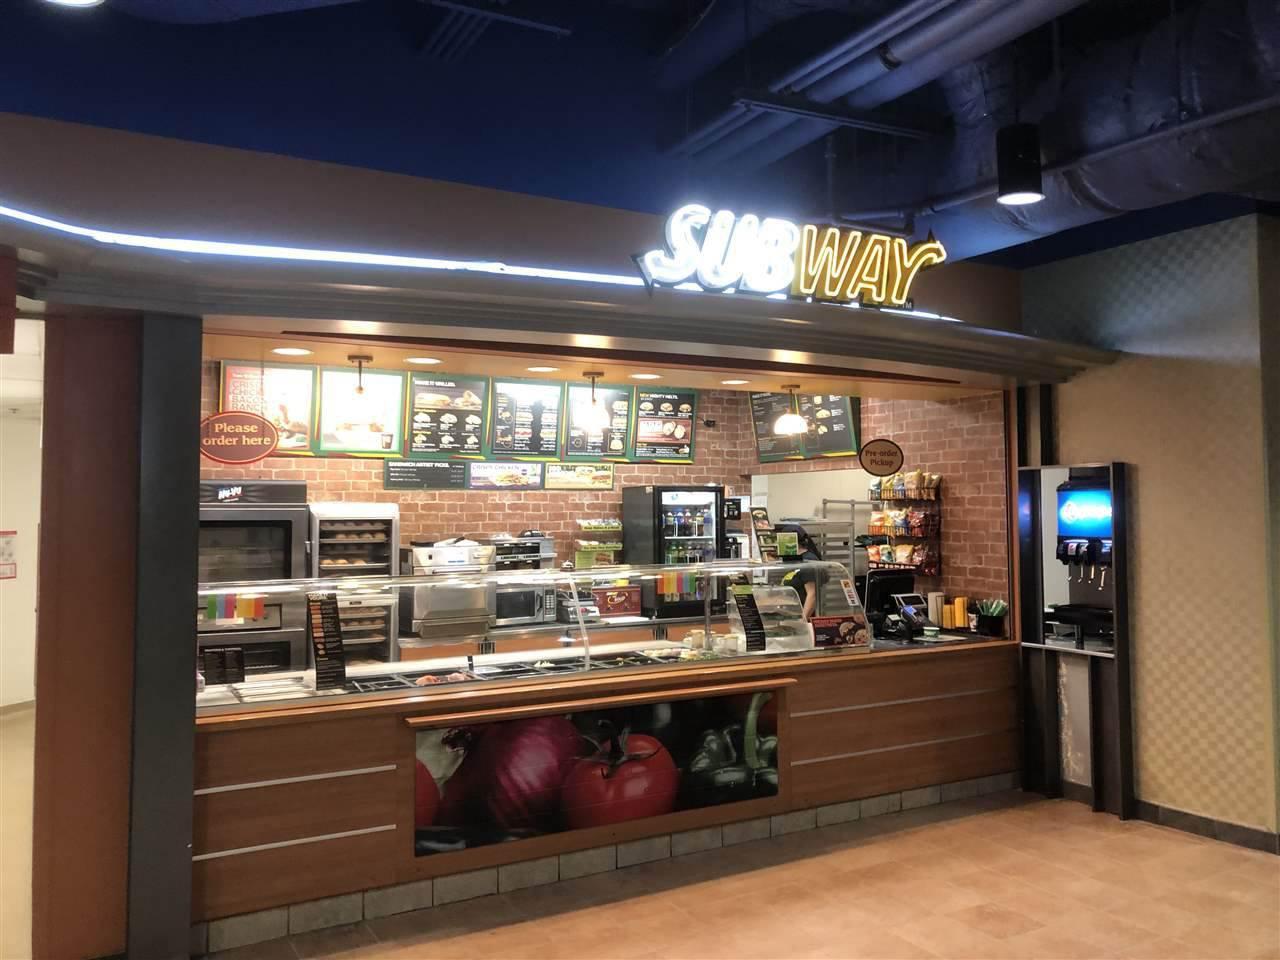 Main Photo: 0 NA in Edmonton: Zone 12 Business for sale : MLS®# E4220588